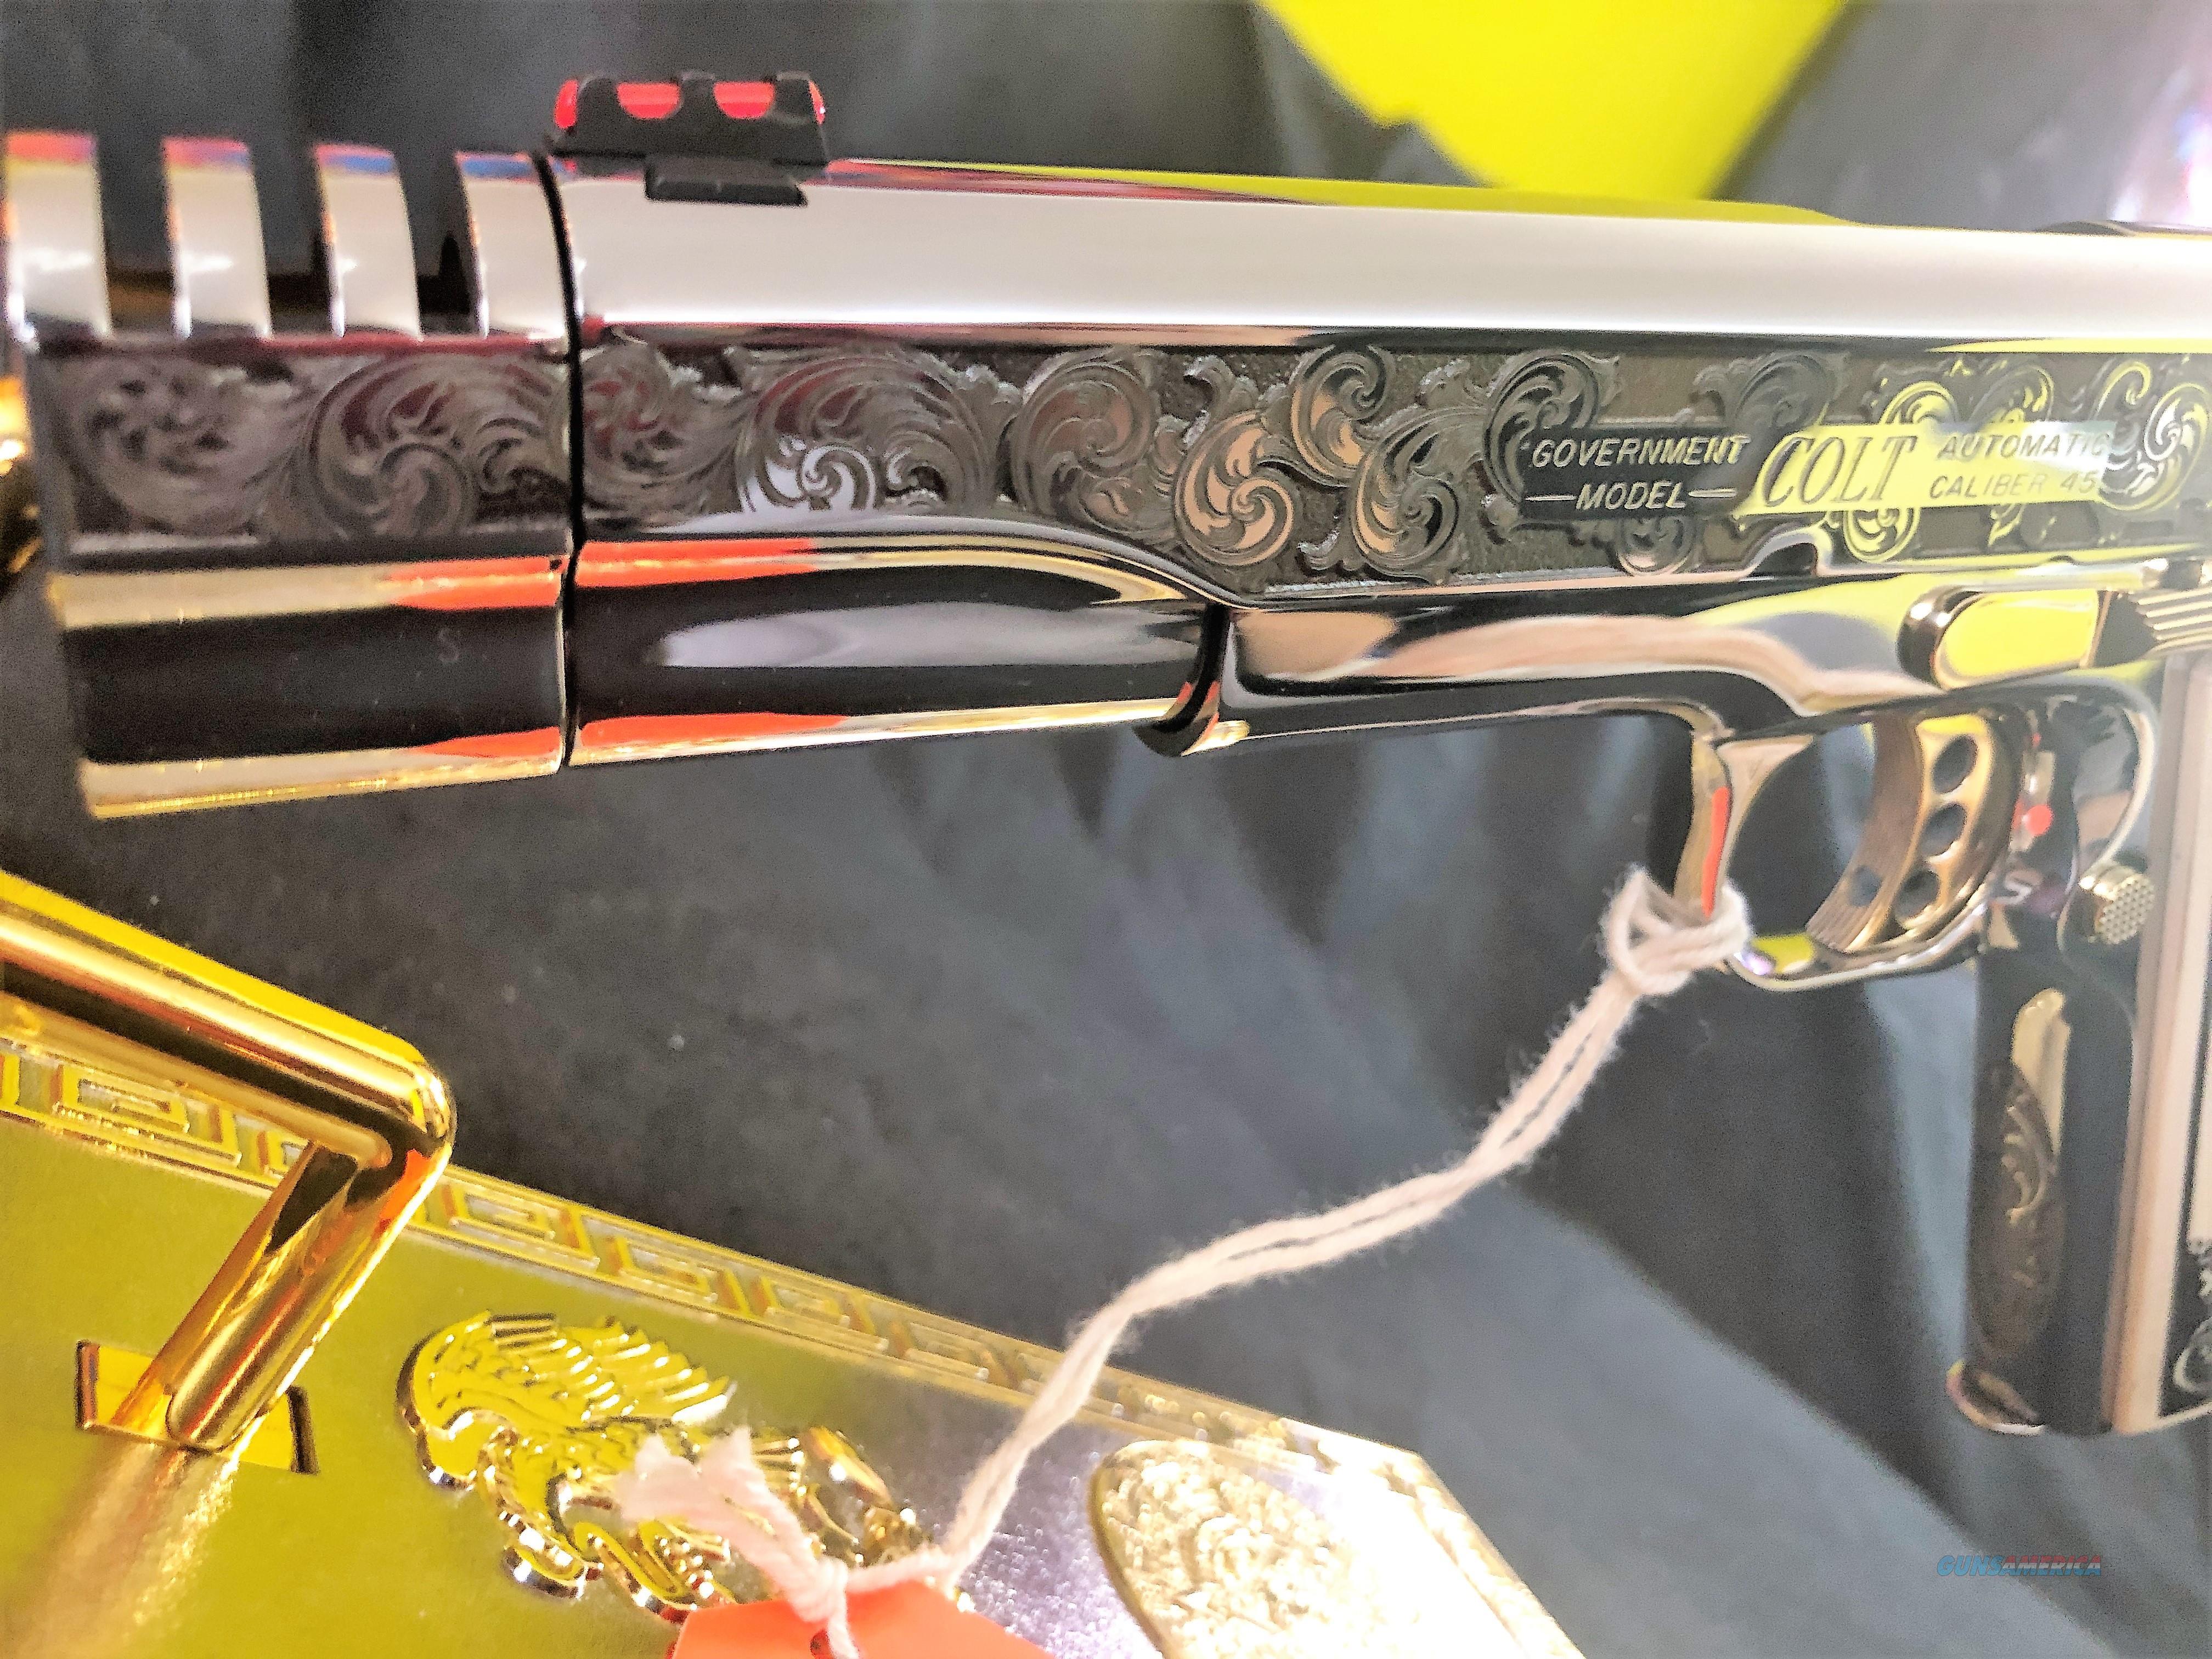 Custom Engraved 24k Colt Government 1911 .45 acp ONE OF A KIND  Guns > Pistols > Colt Automatic Pistols (1911 & Var)